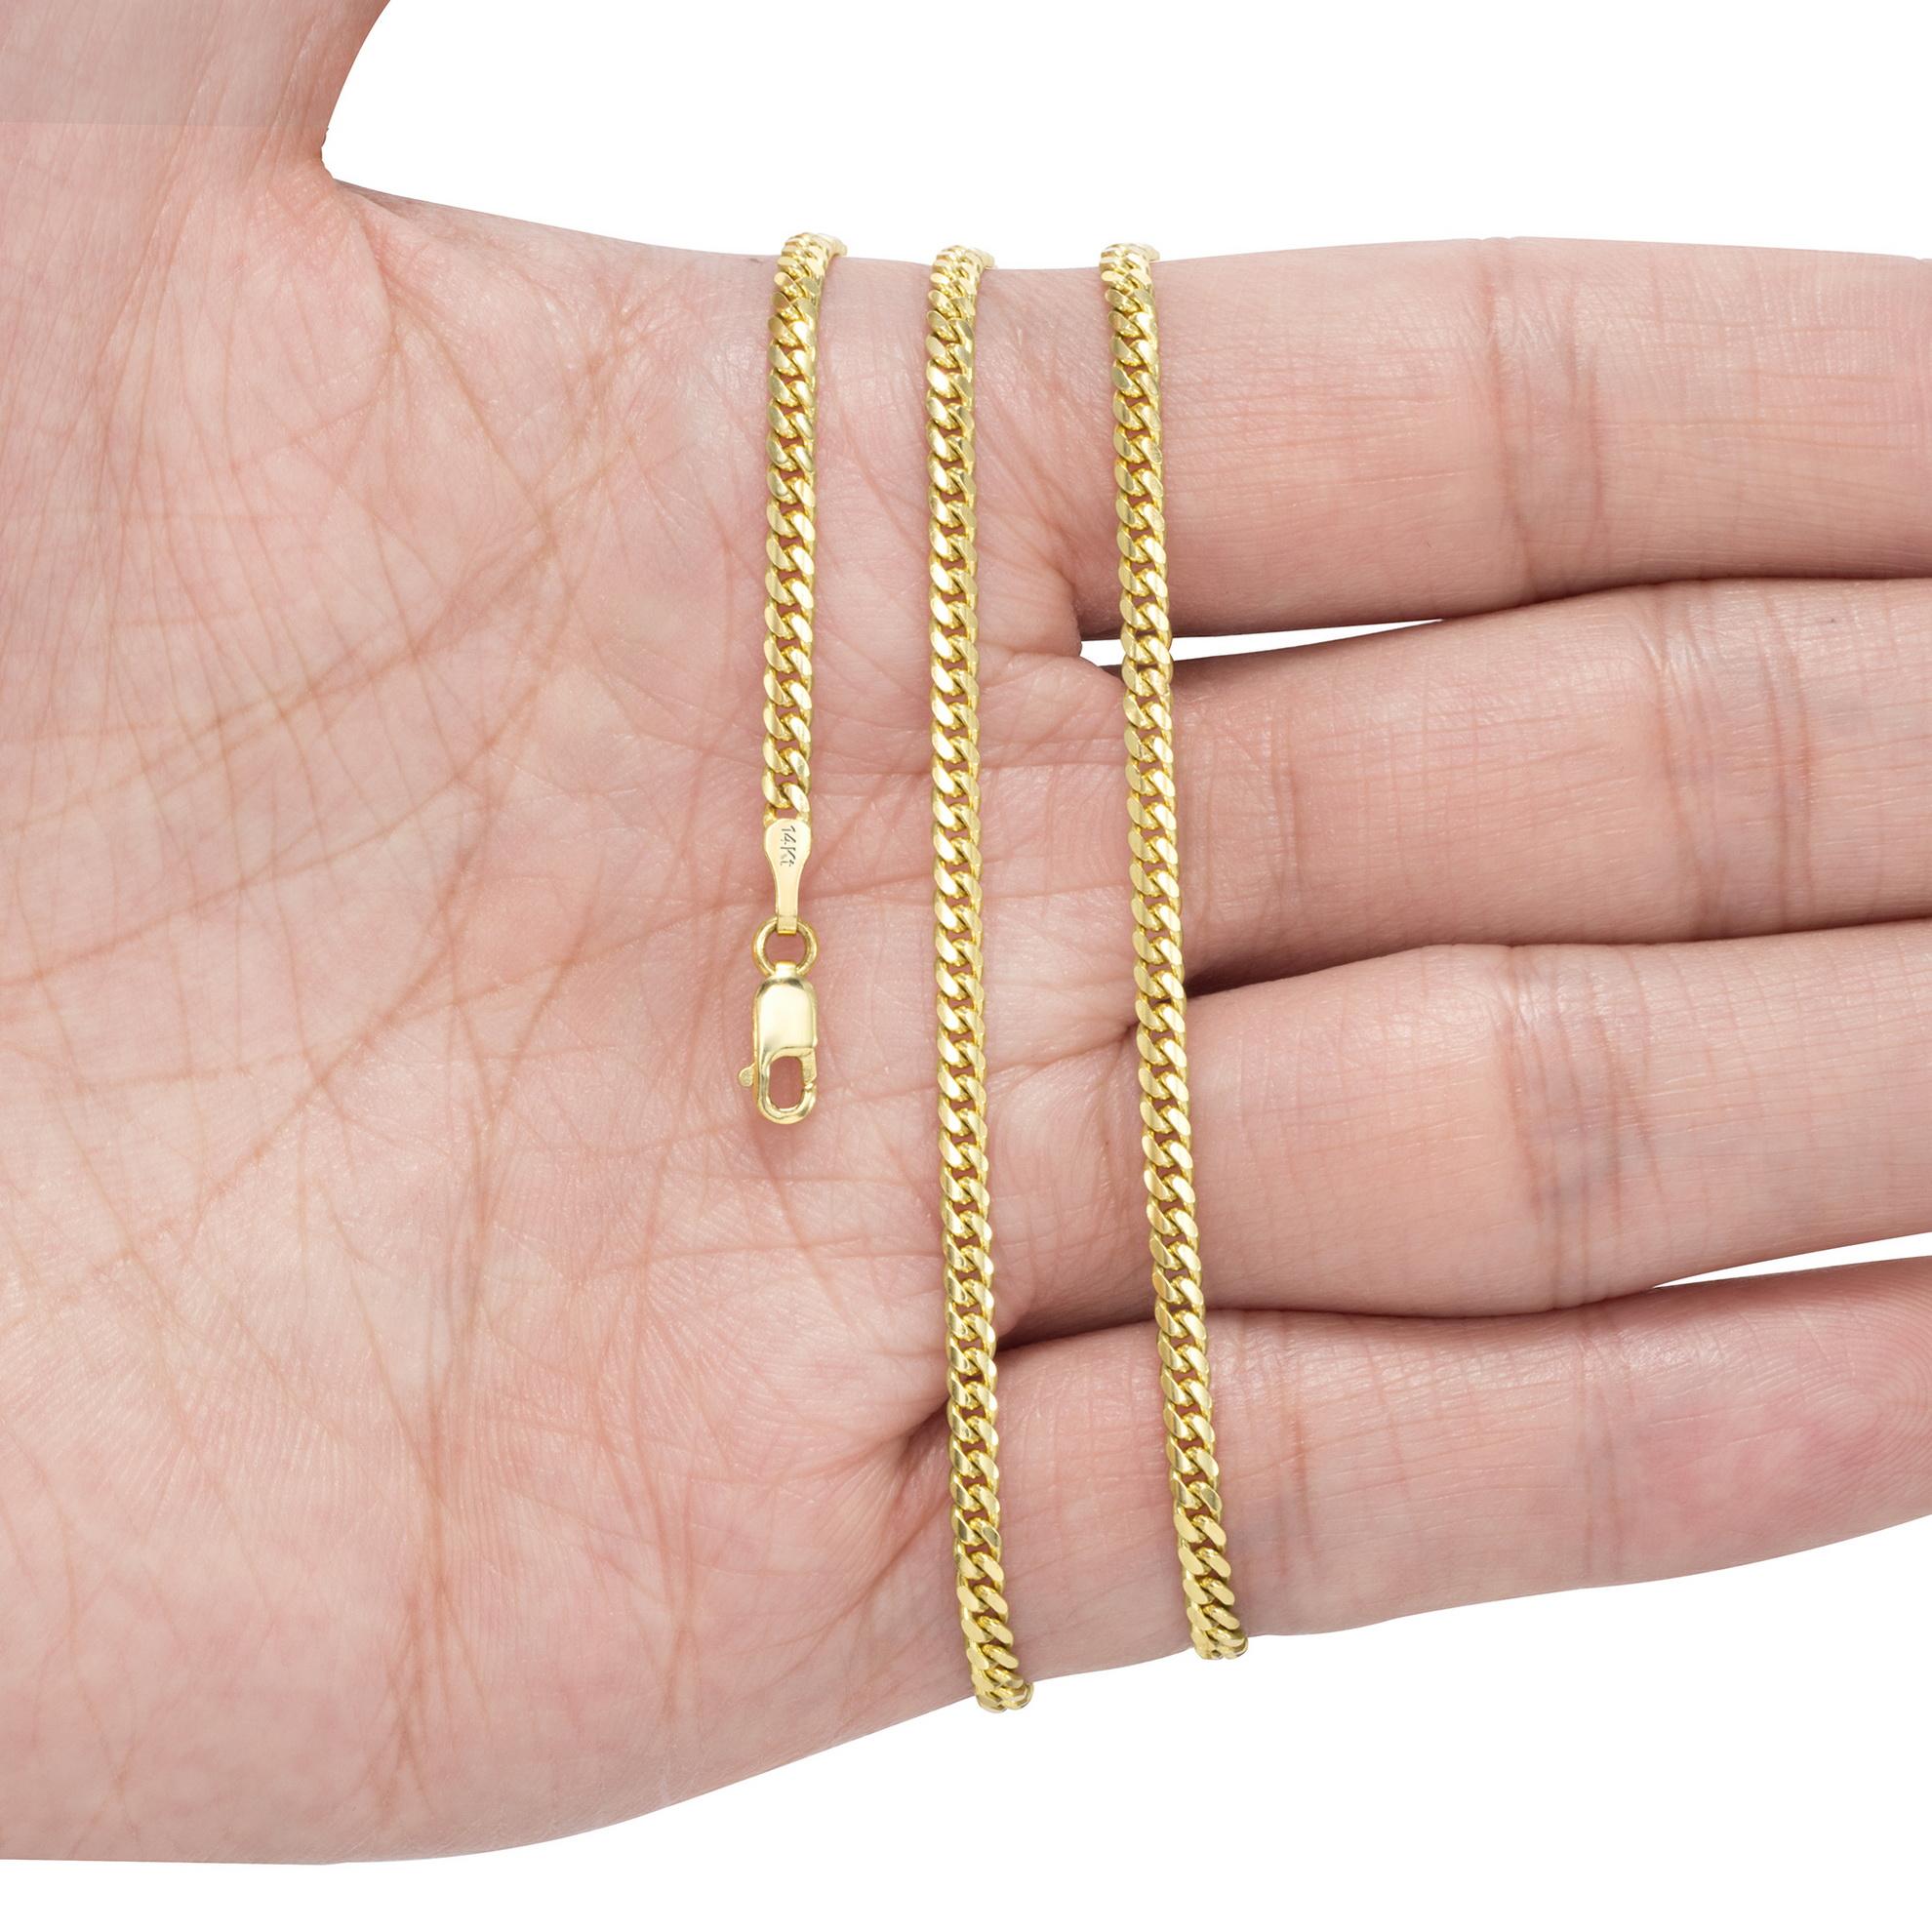 14K-Yellow-Gold-Solid-2-7mm-11mm-Miami-Cuban-Link-Chain-Bracelet-Men-Women-7-034-9-034 thumbnail 13